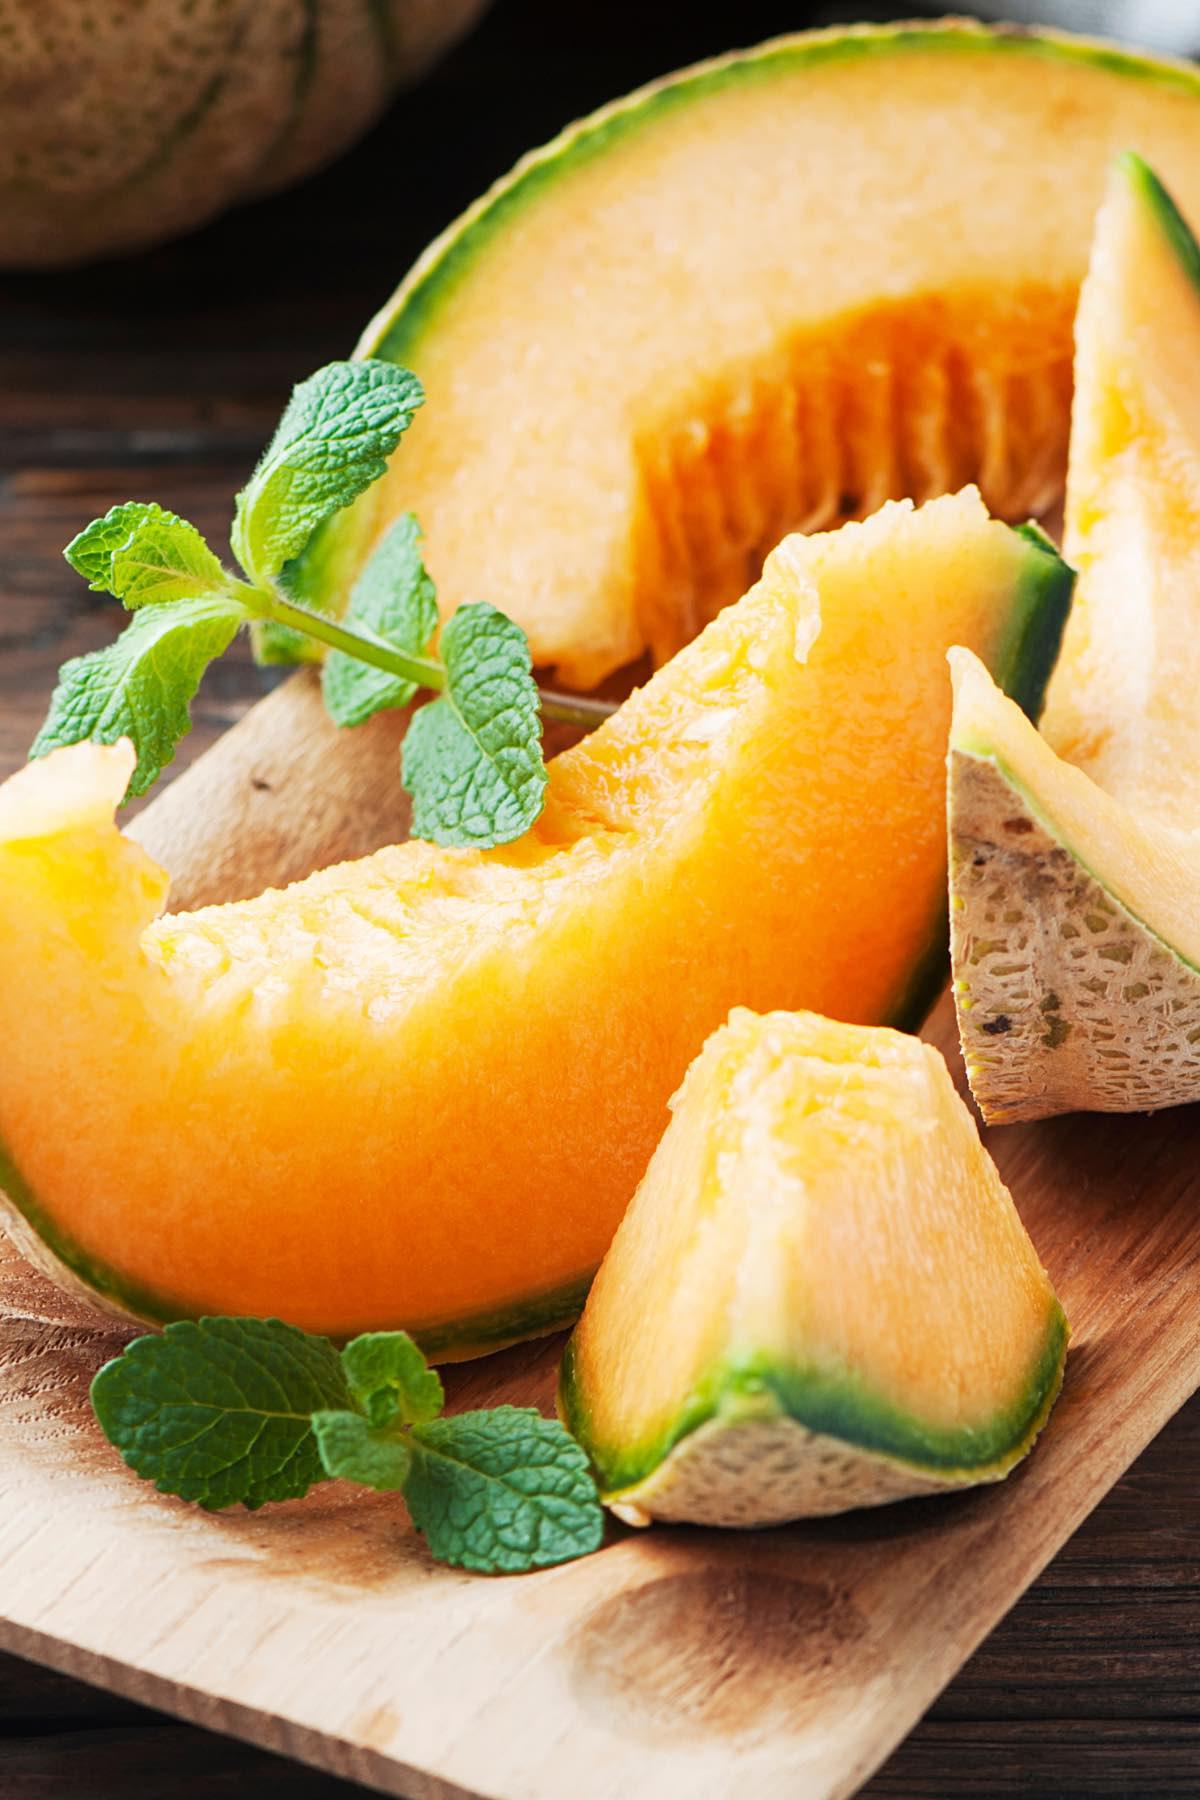 Serving of ripe cantaloupe